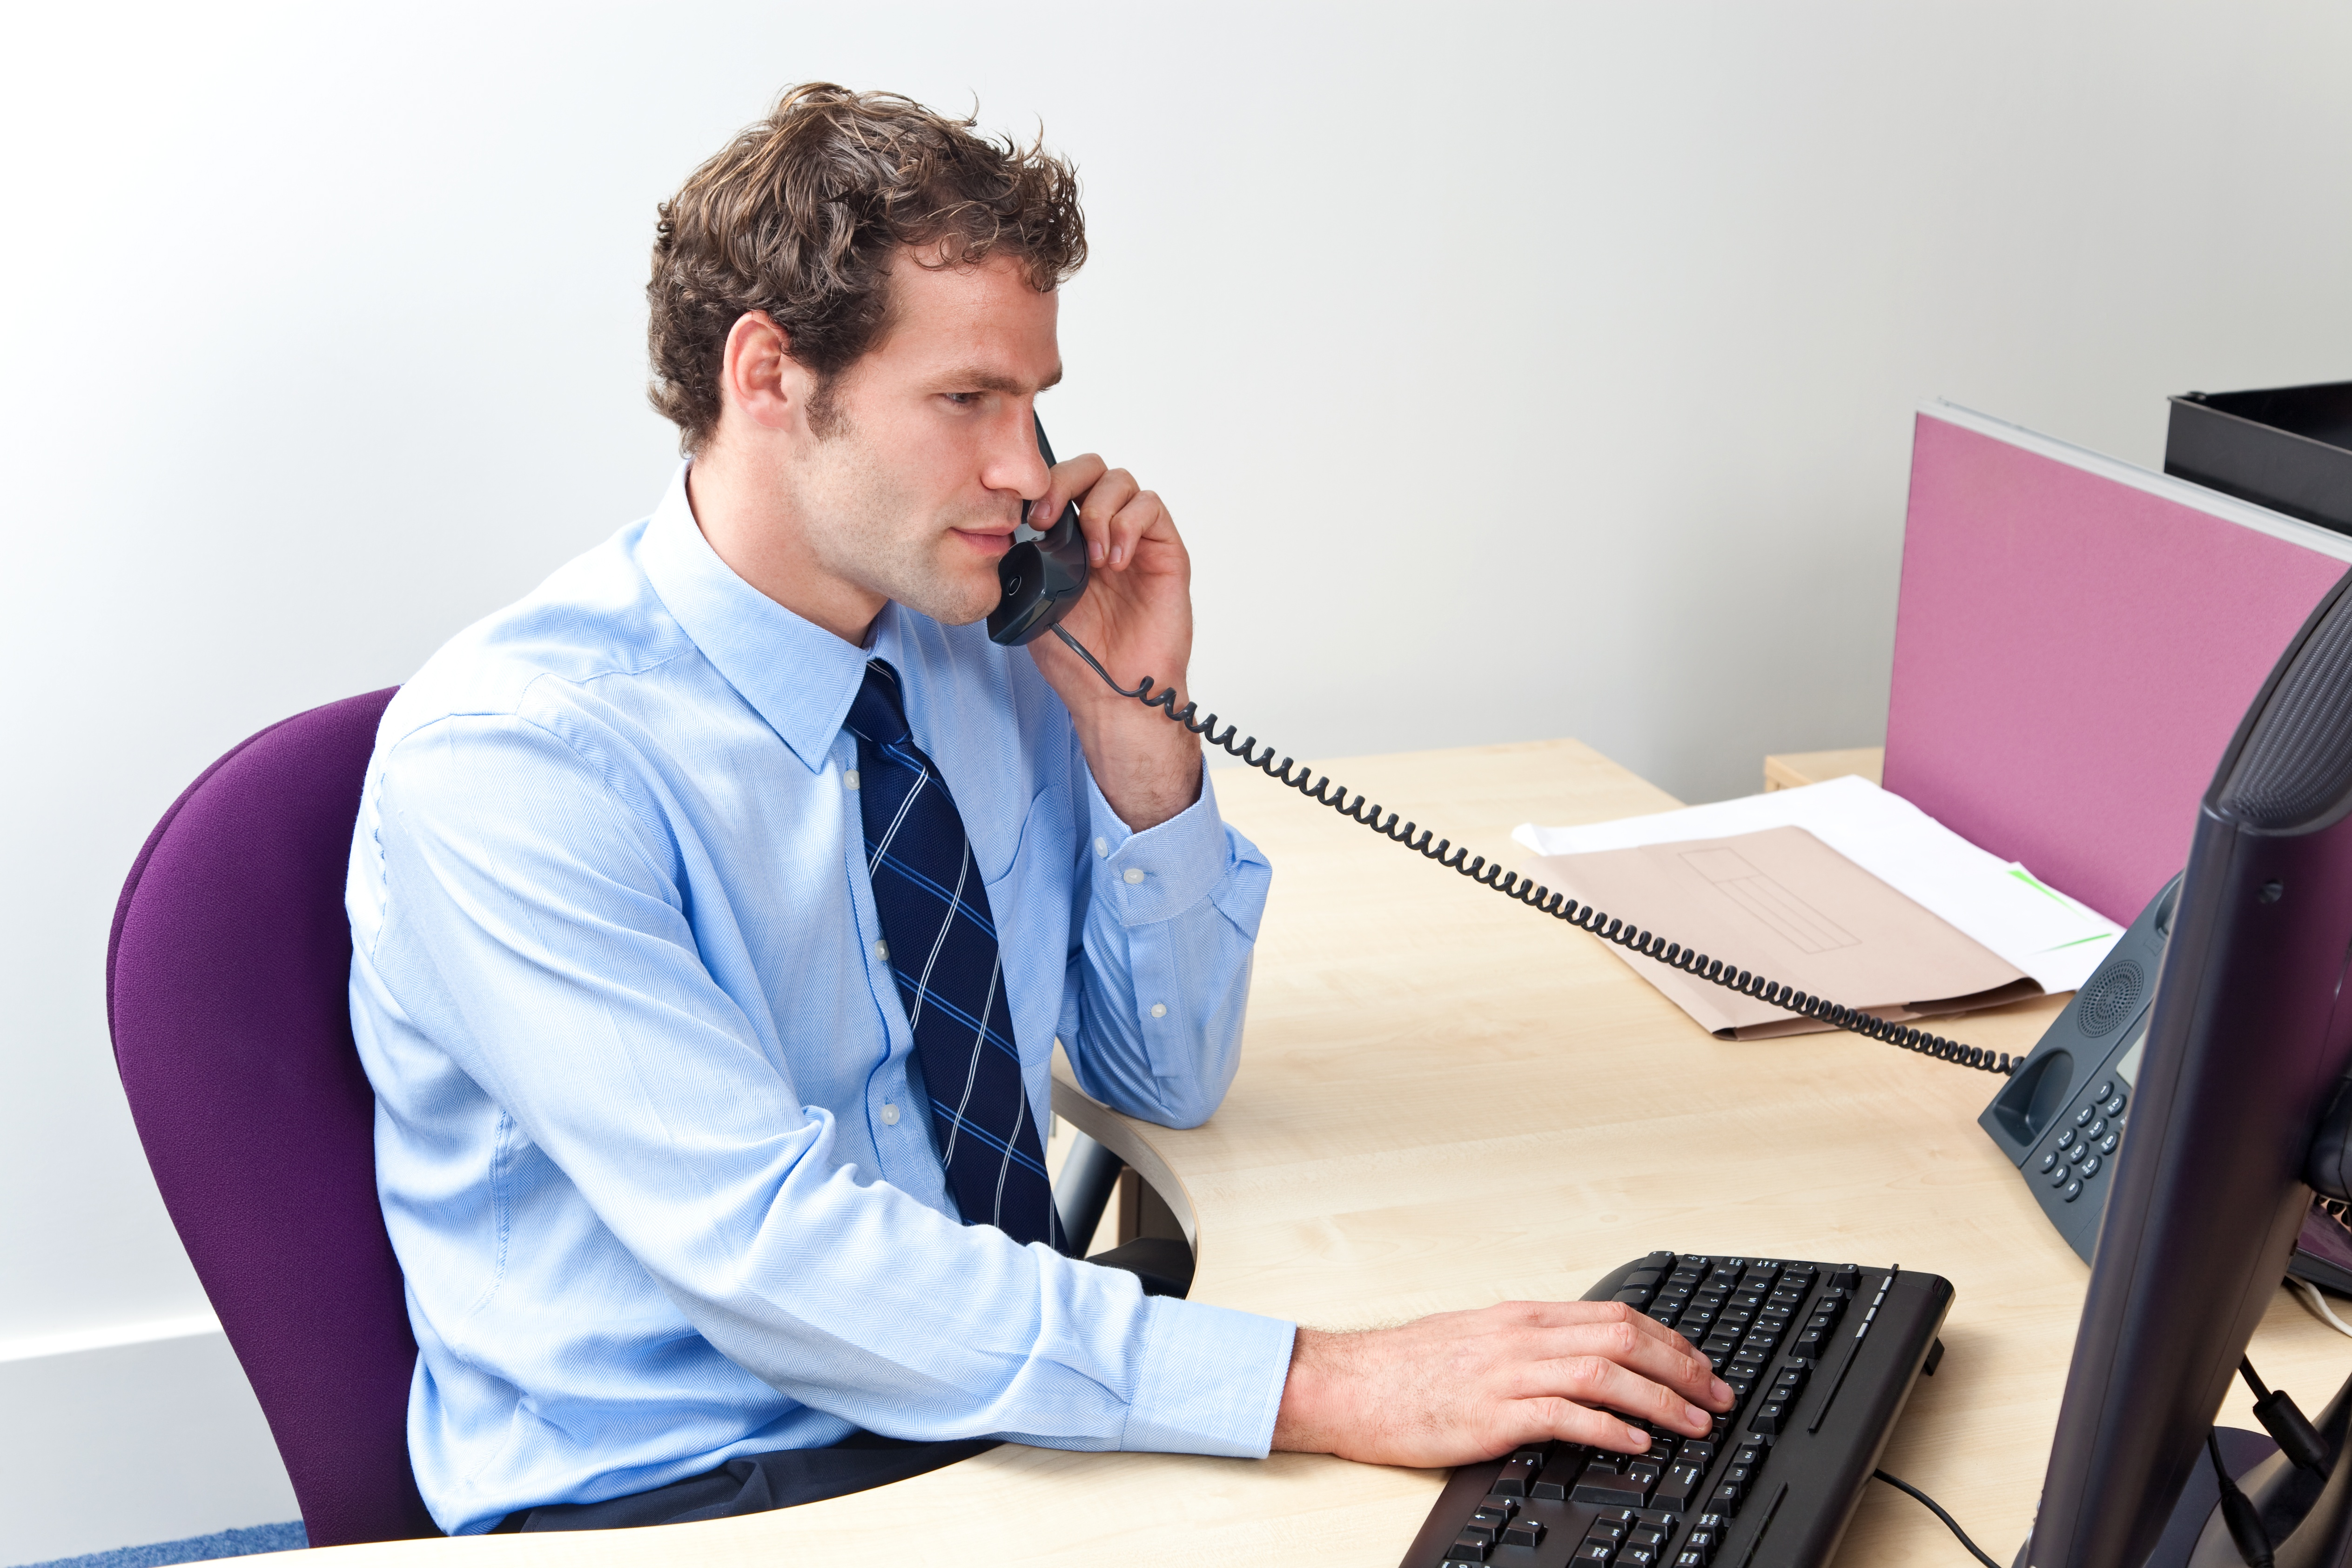 bigstock-Customer-Care-Worker-In-An-Off-7006452.jpg